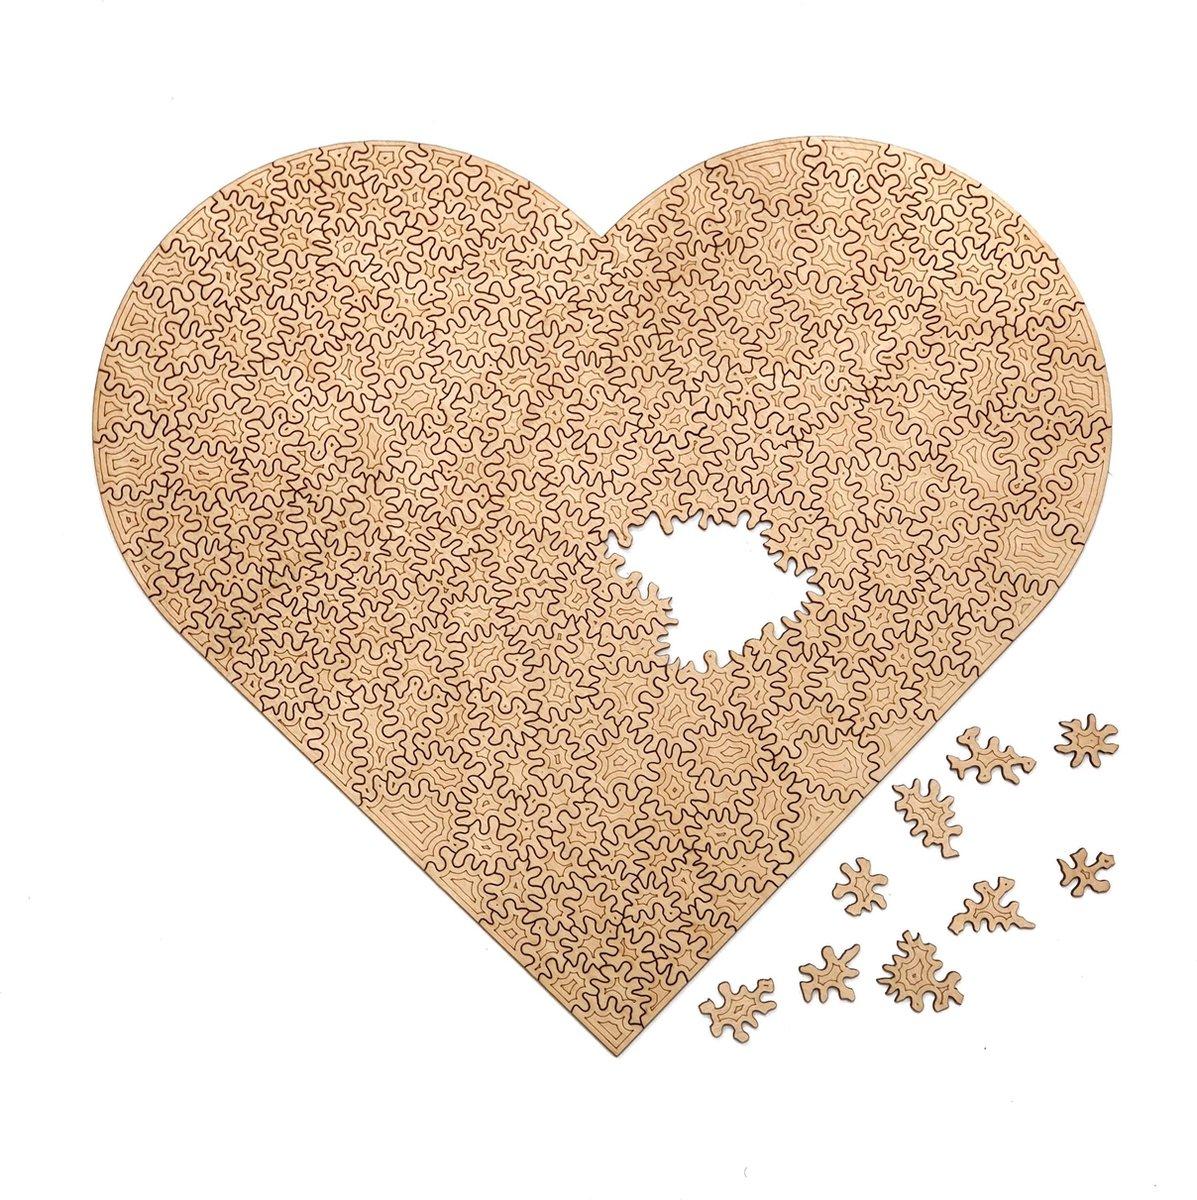 Gebroken Hart | Houten Puzzel | Chaos serie - 300 stukjes | Legpuzzel | Jigsaw| Origineel Dutch design | Geproduceerd in Nederland | Kaboomlaser